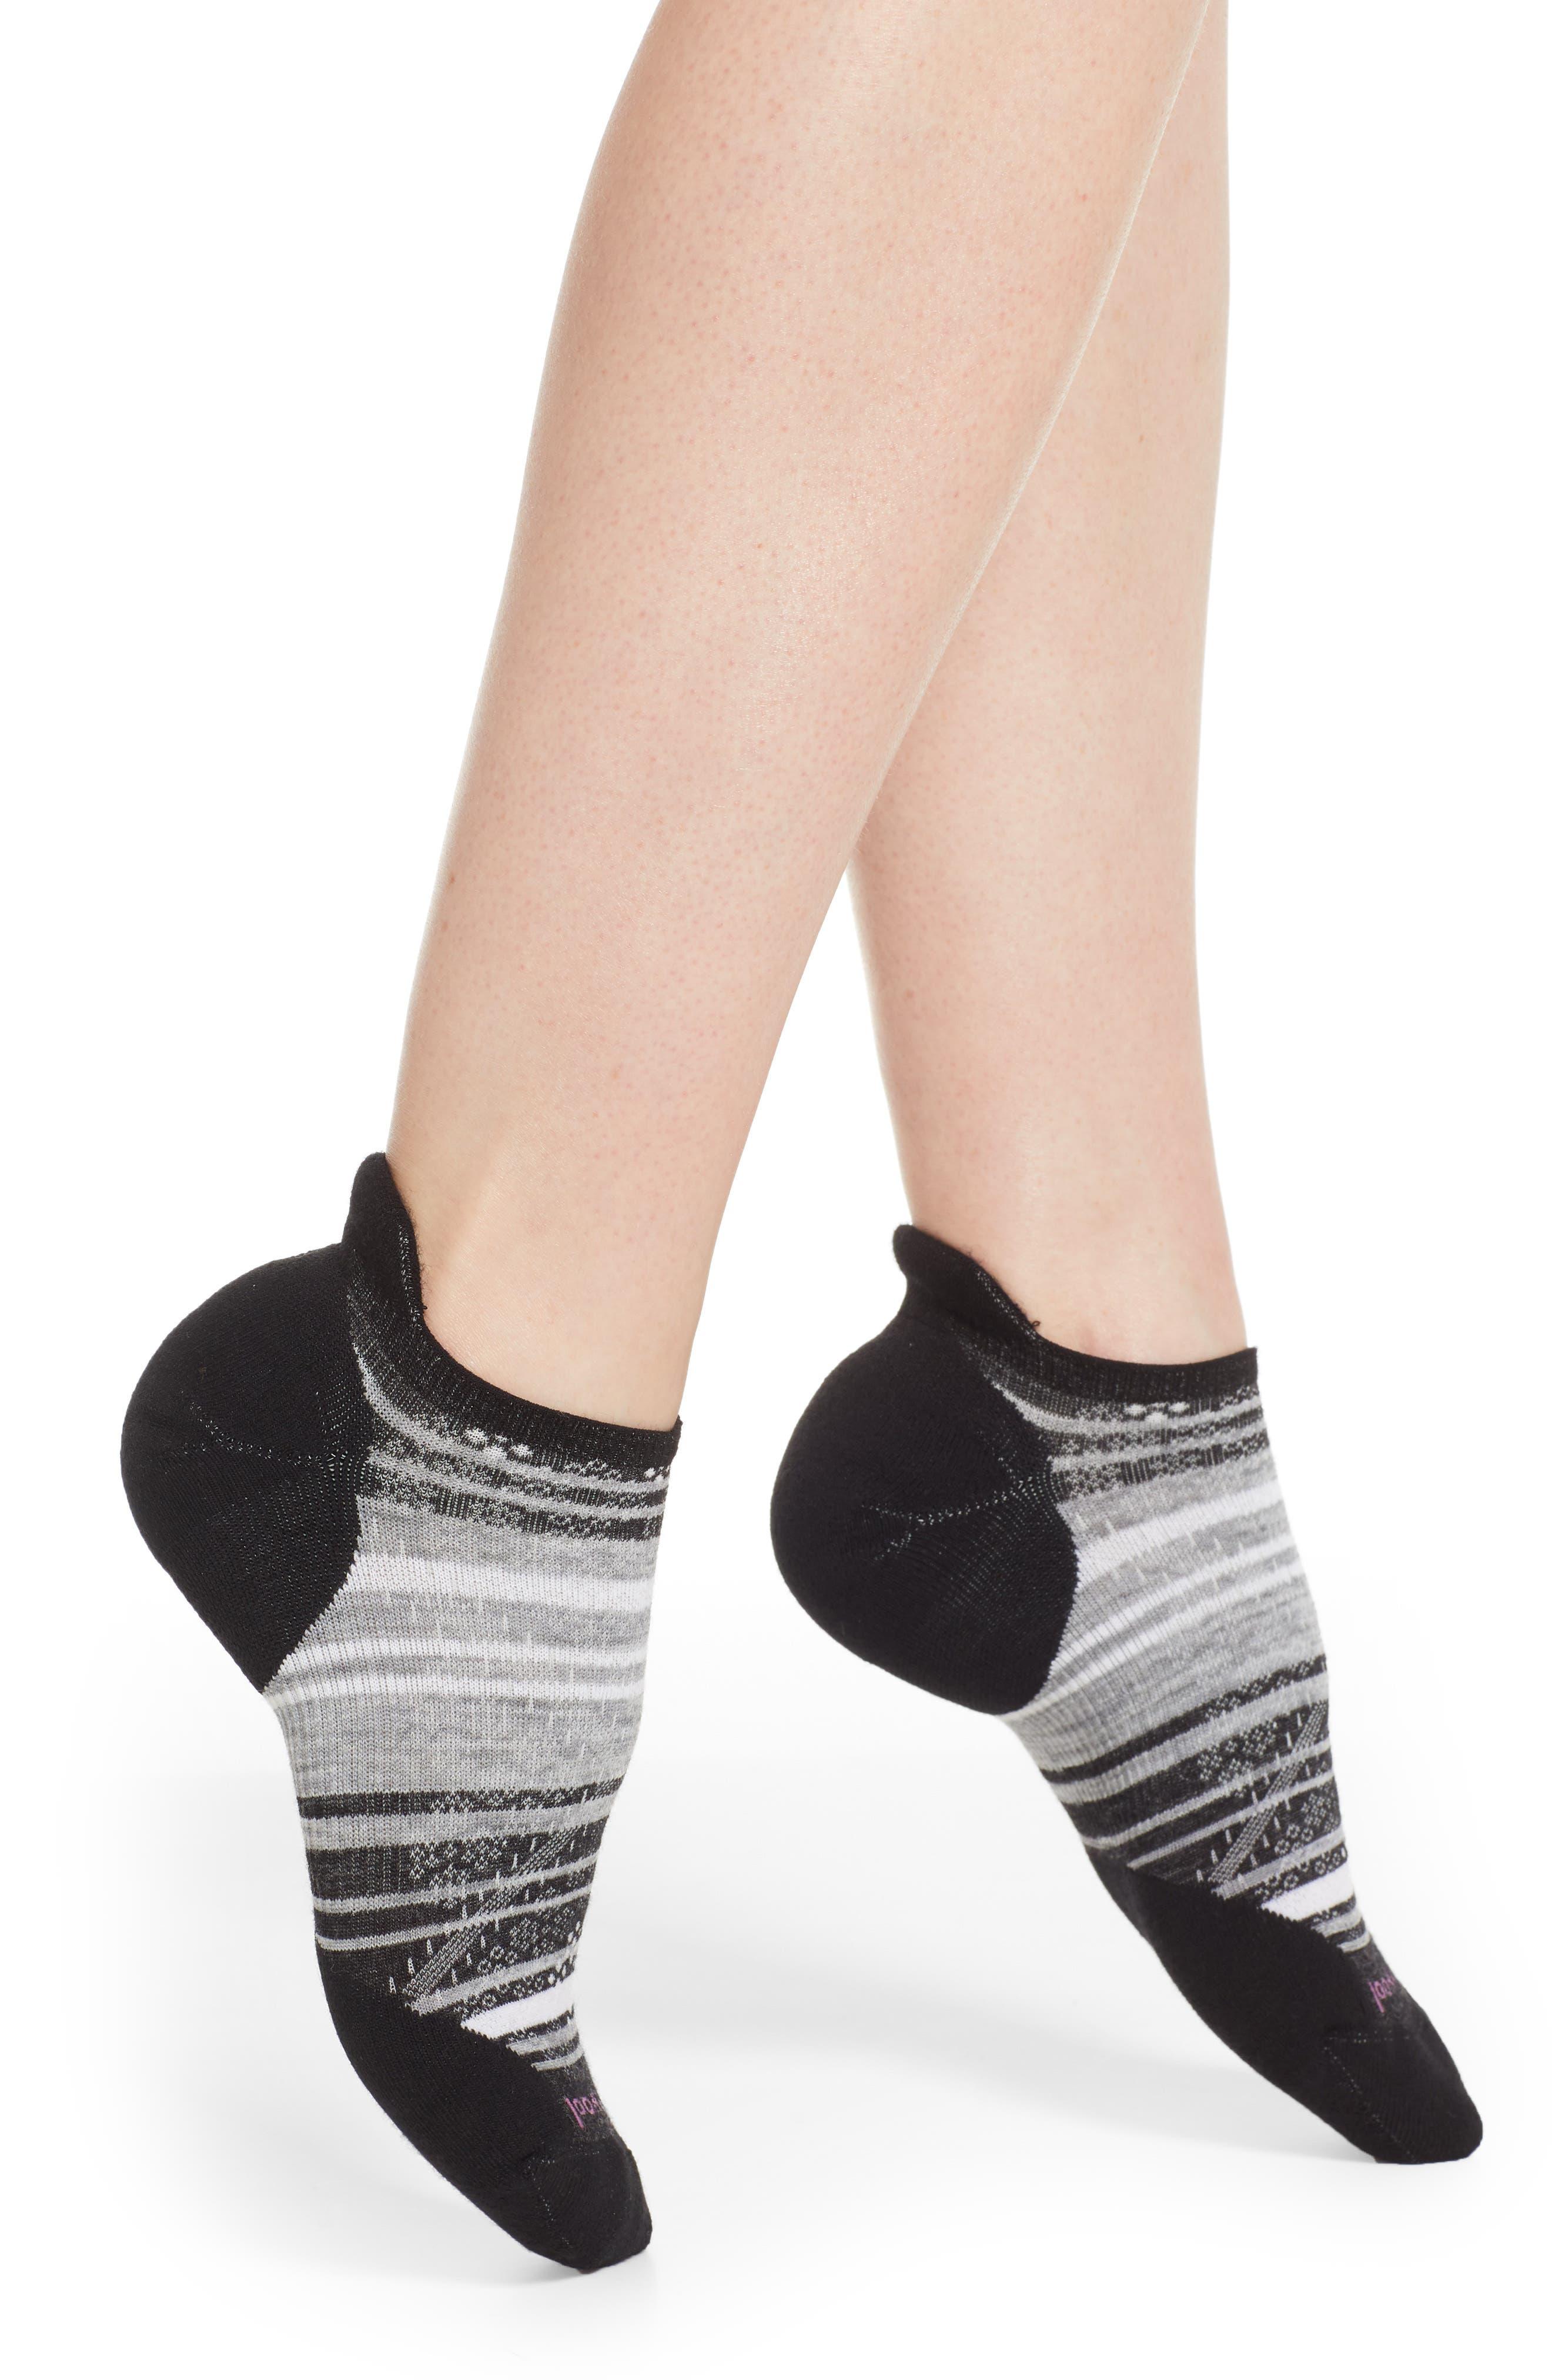 PhD<sup>®</sup> Run Light Elite Socks, Main, color, BLACK/ LIGHT GRAY